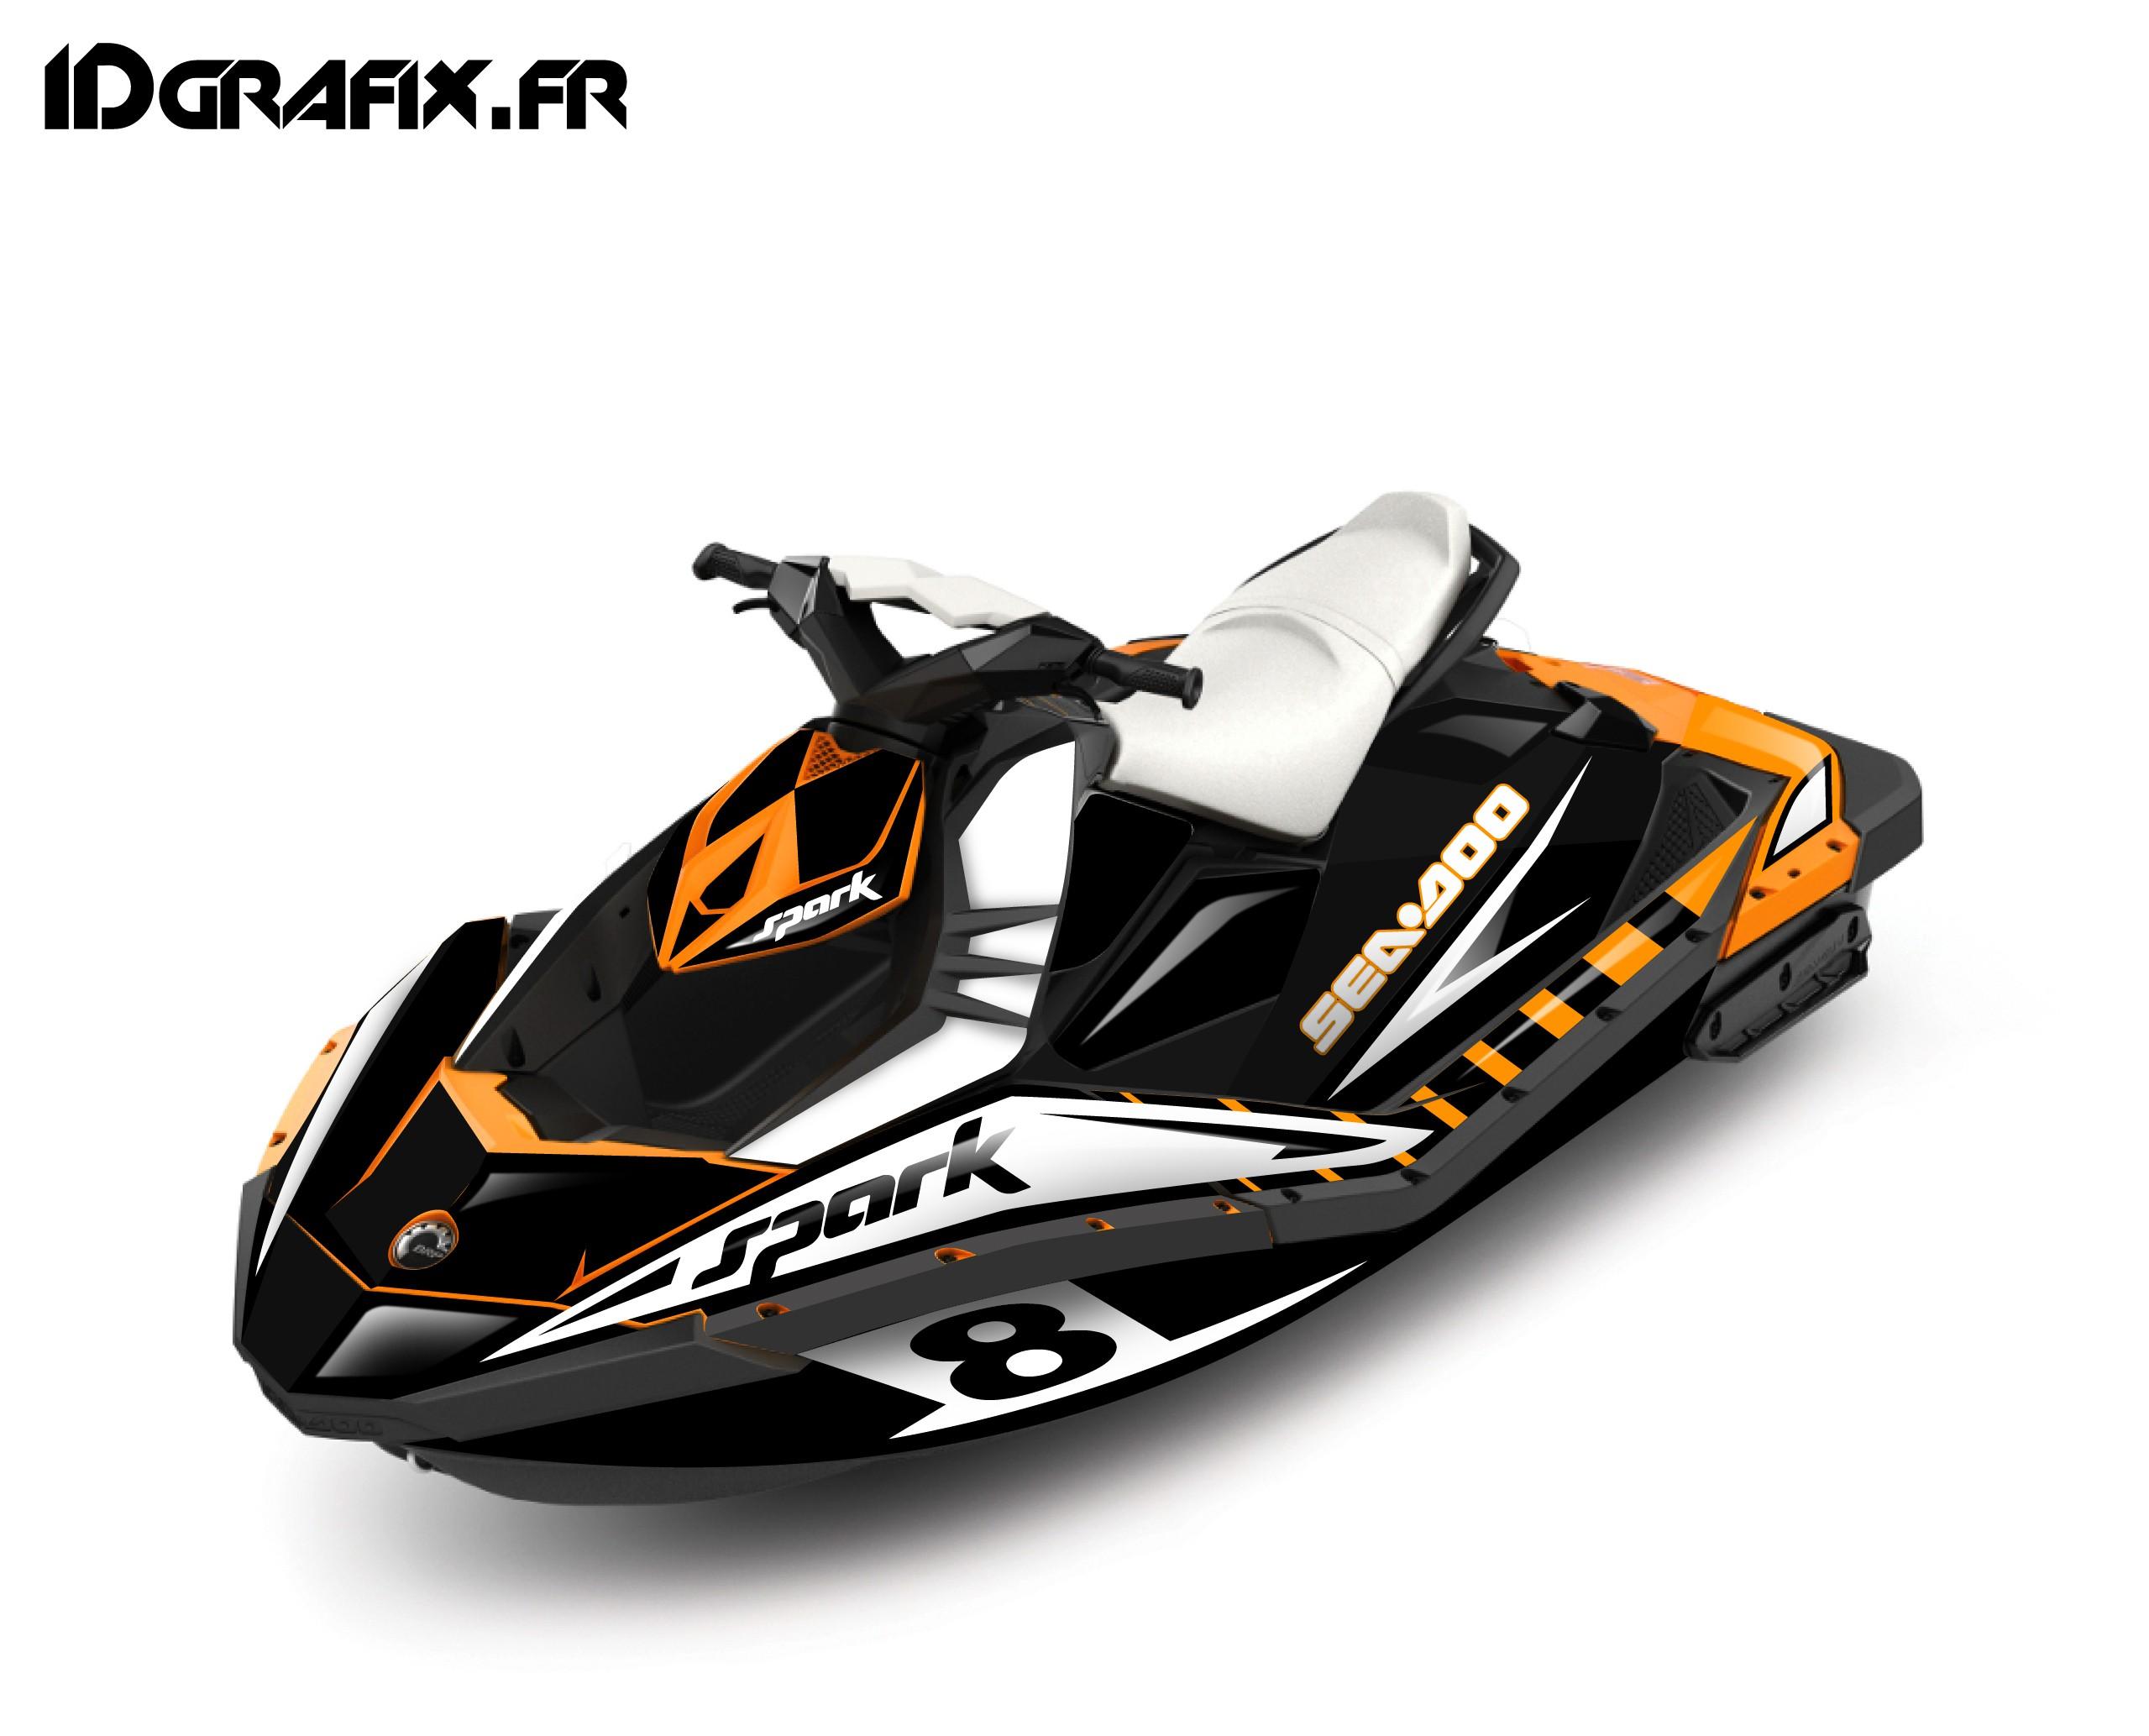 Polaris Trailblazer 250 >> Kit décoration Full Spark Limited Orange pour Seadoo Spark - idgrafix